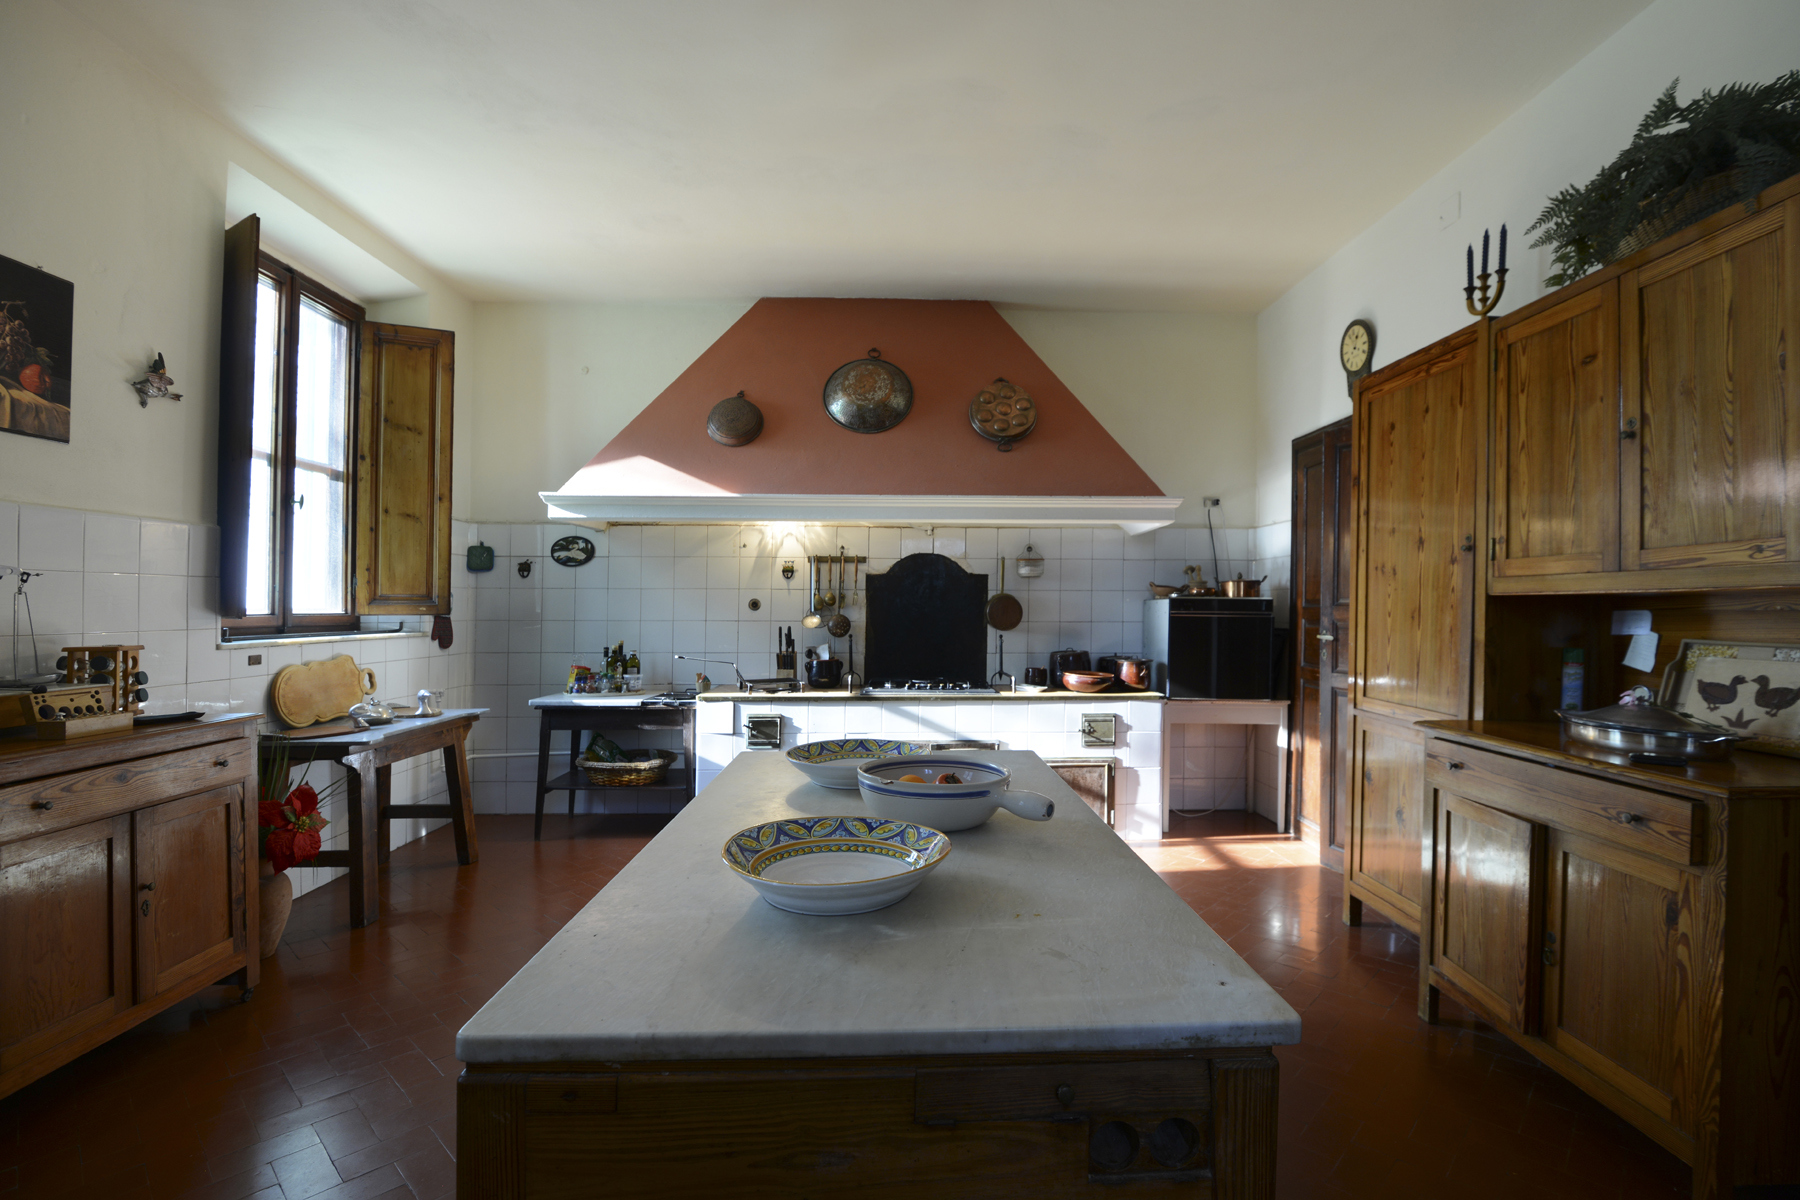 Villa in Vendita a Casciana Terme Lari: 5 locali, 1800 mq - Foto 17